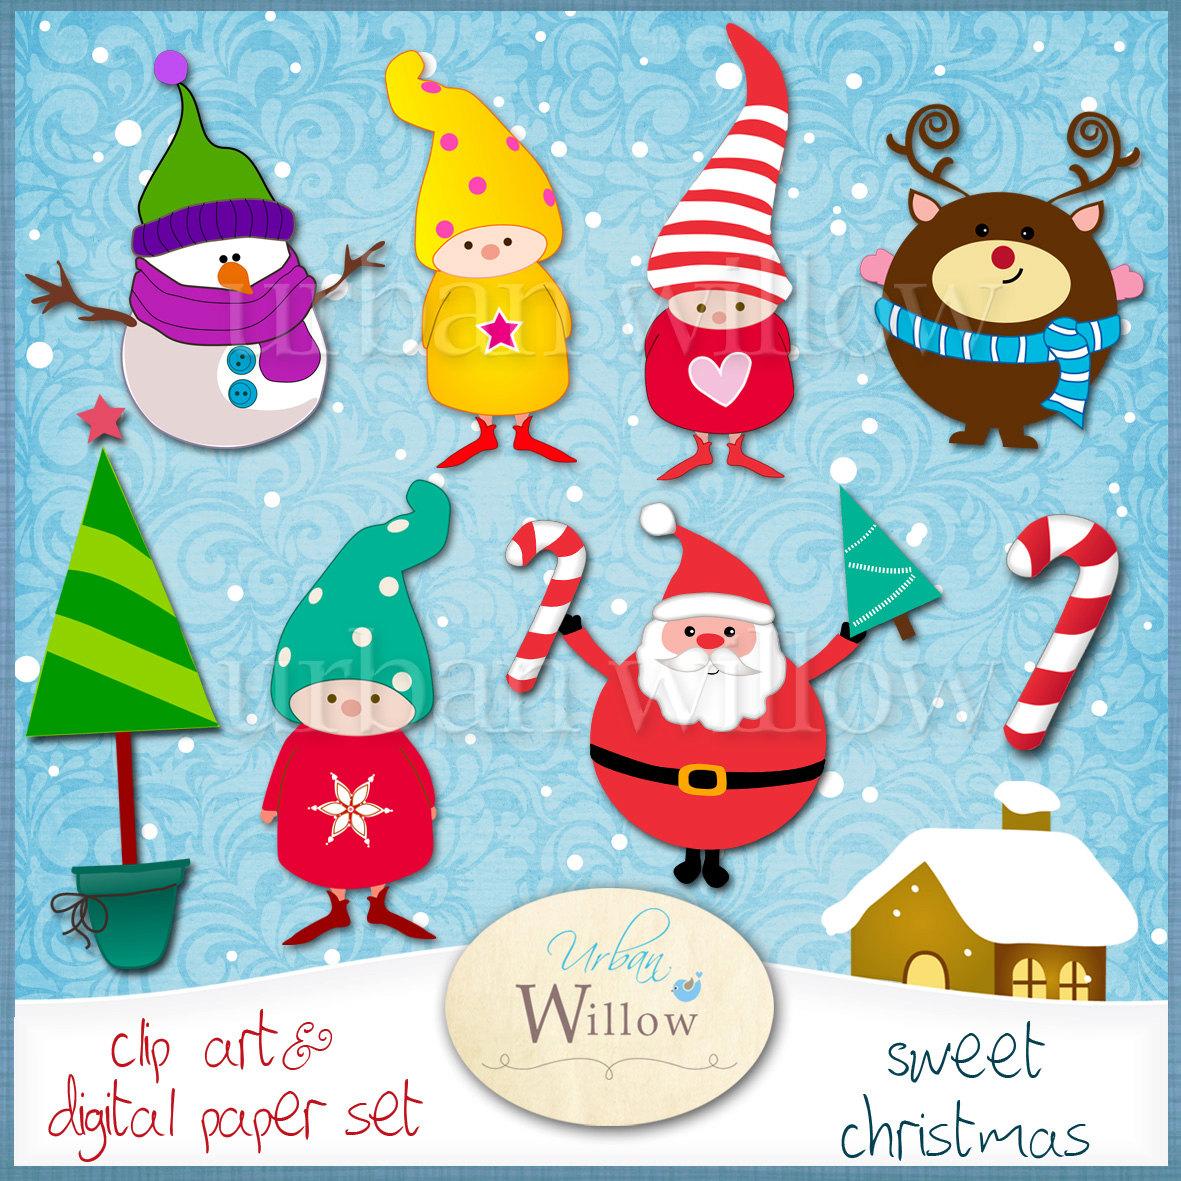 Candy Cane clipart christmas reindeer Clipart Santa Cane Digital Clipart